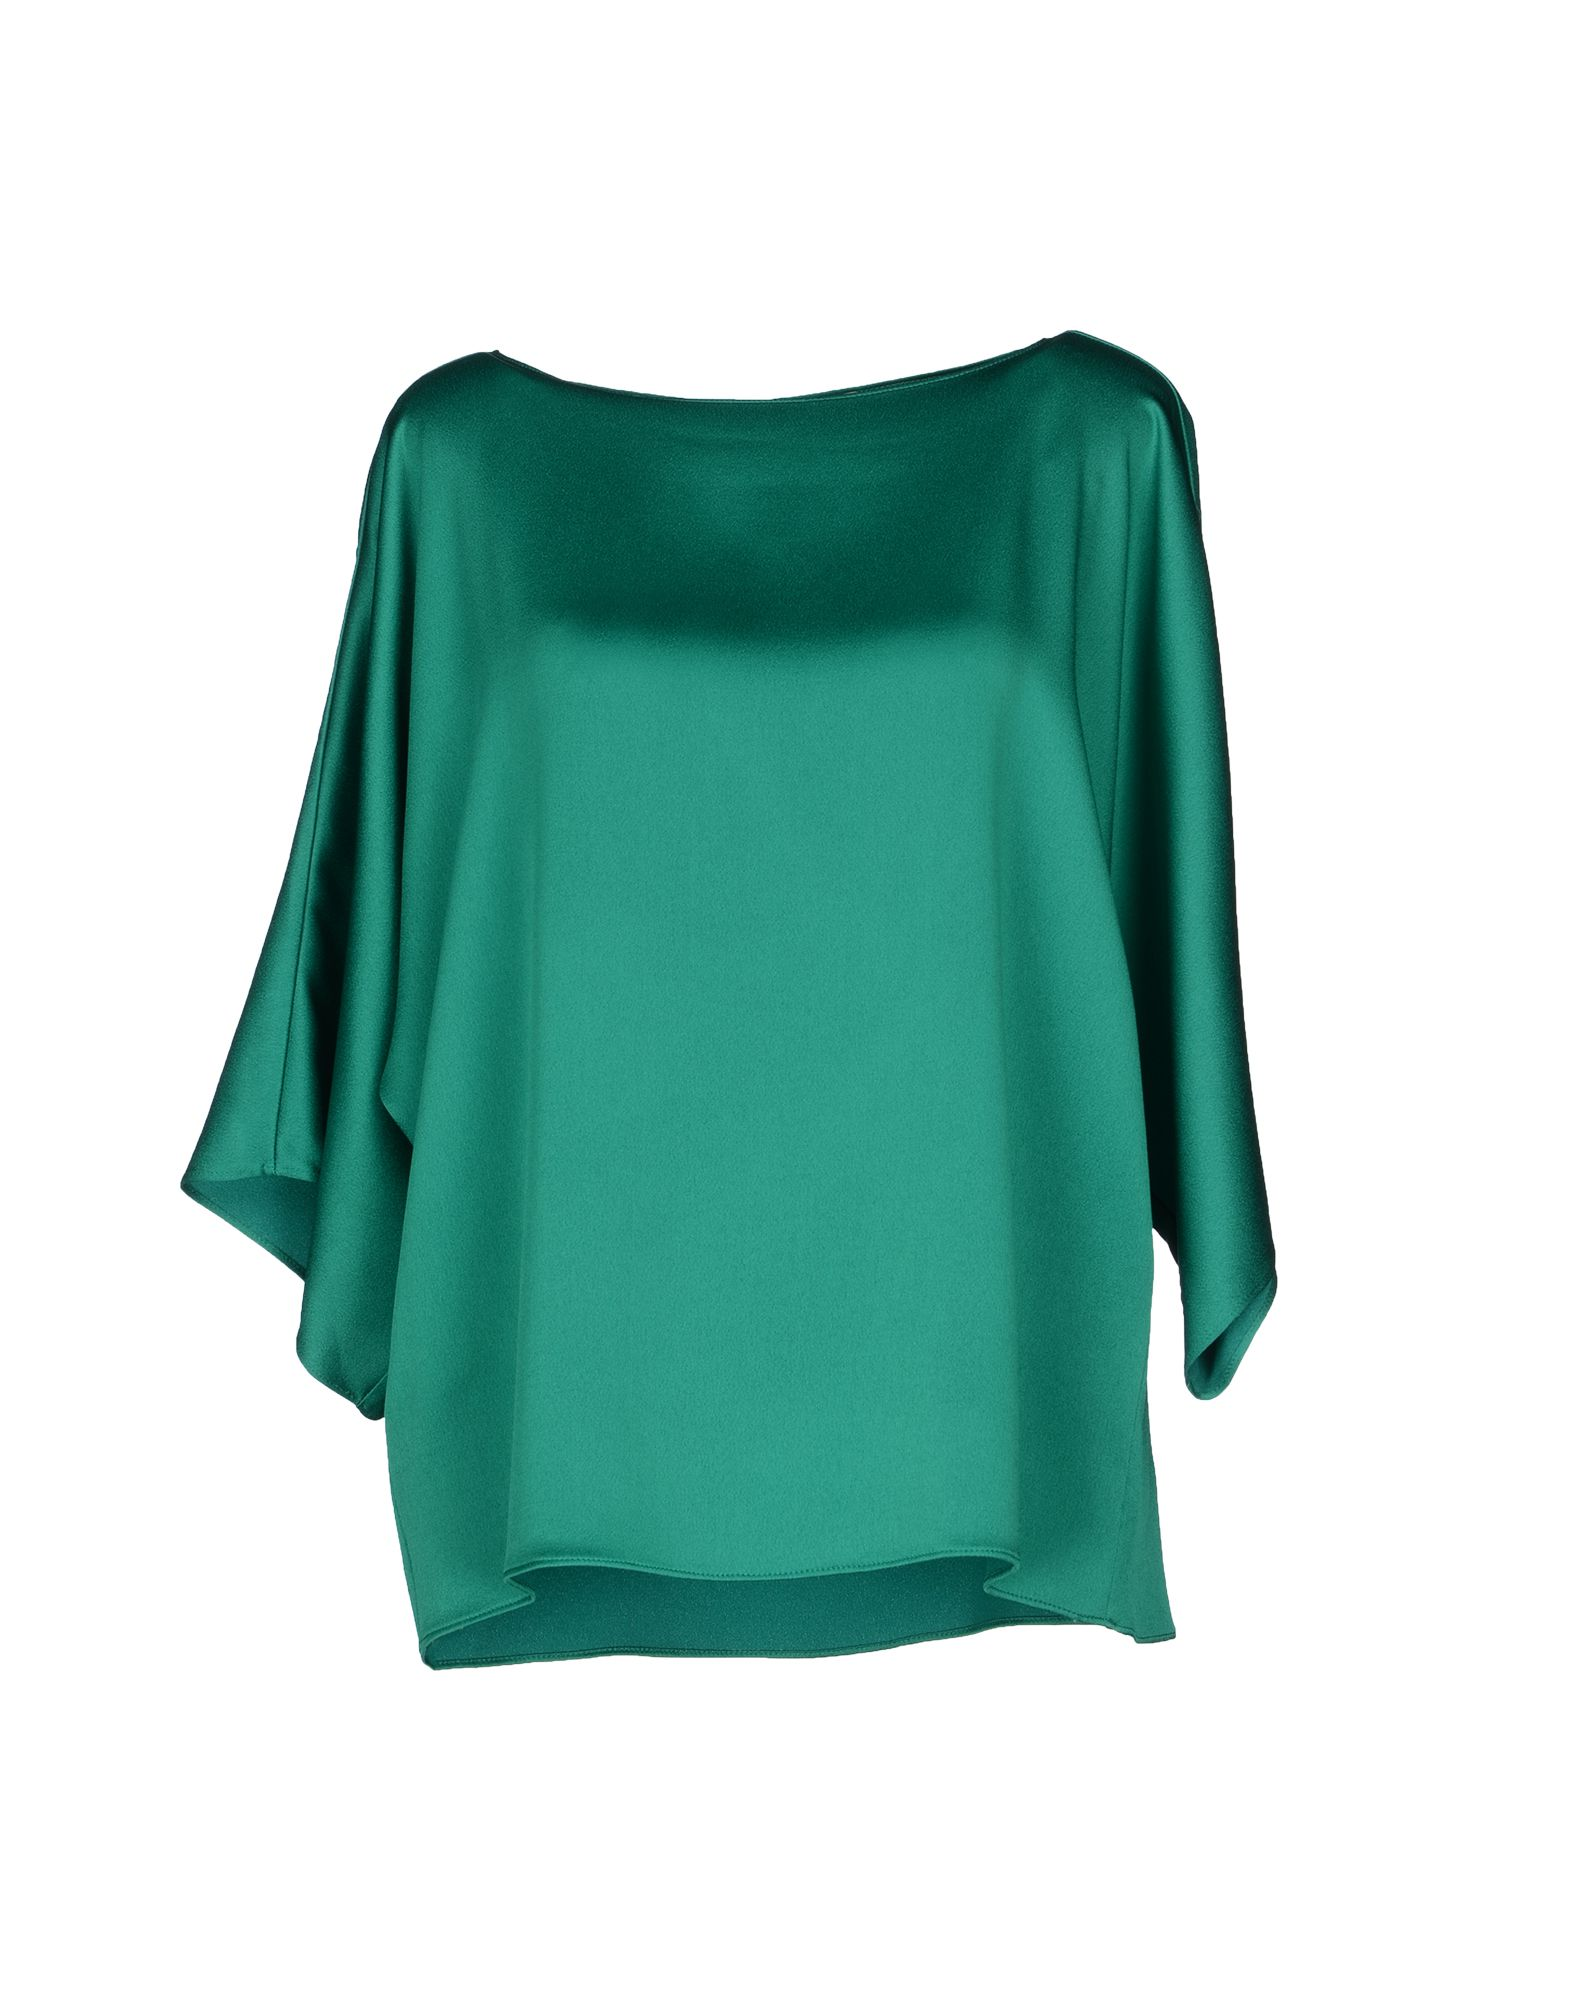 michael kors blouse in green lyst. Black Bedroom Furniture Sets. Home Design Ideas